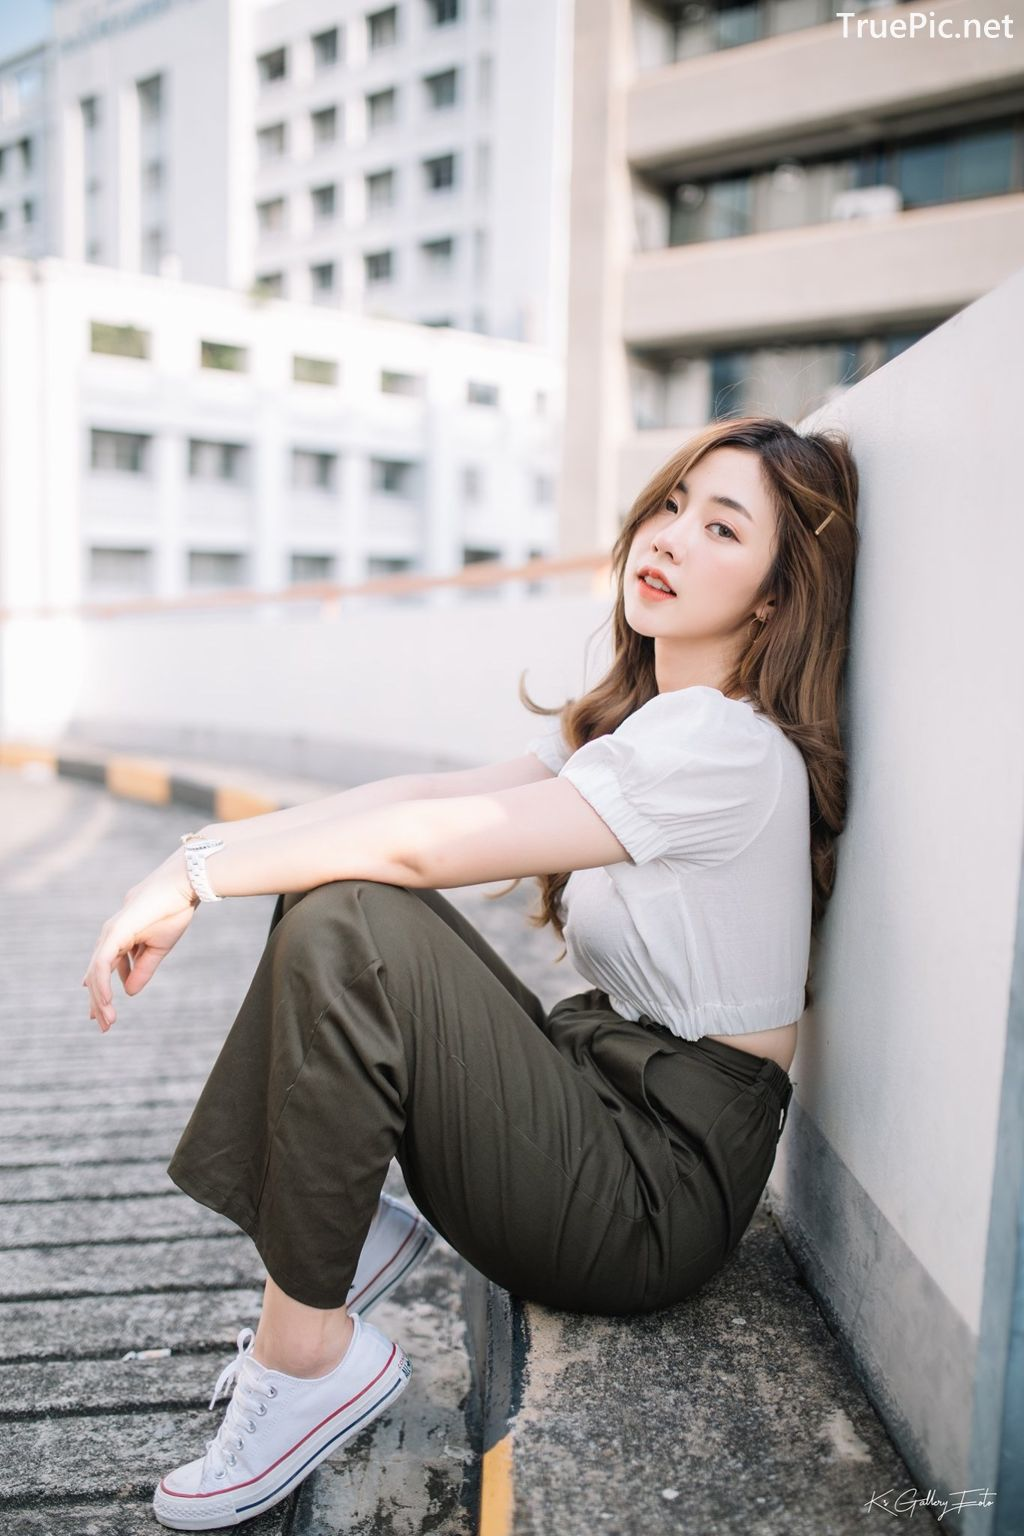 Image Hot Girl Thailand – Nilawan Iamchuasawad – Charming Smile - TruePic.net - Picture-9